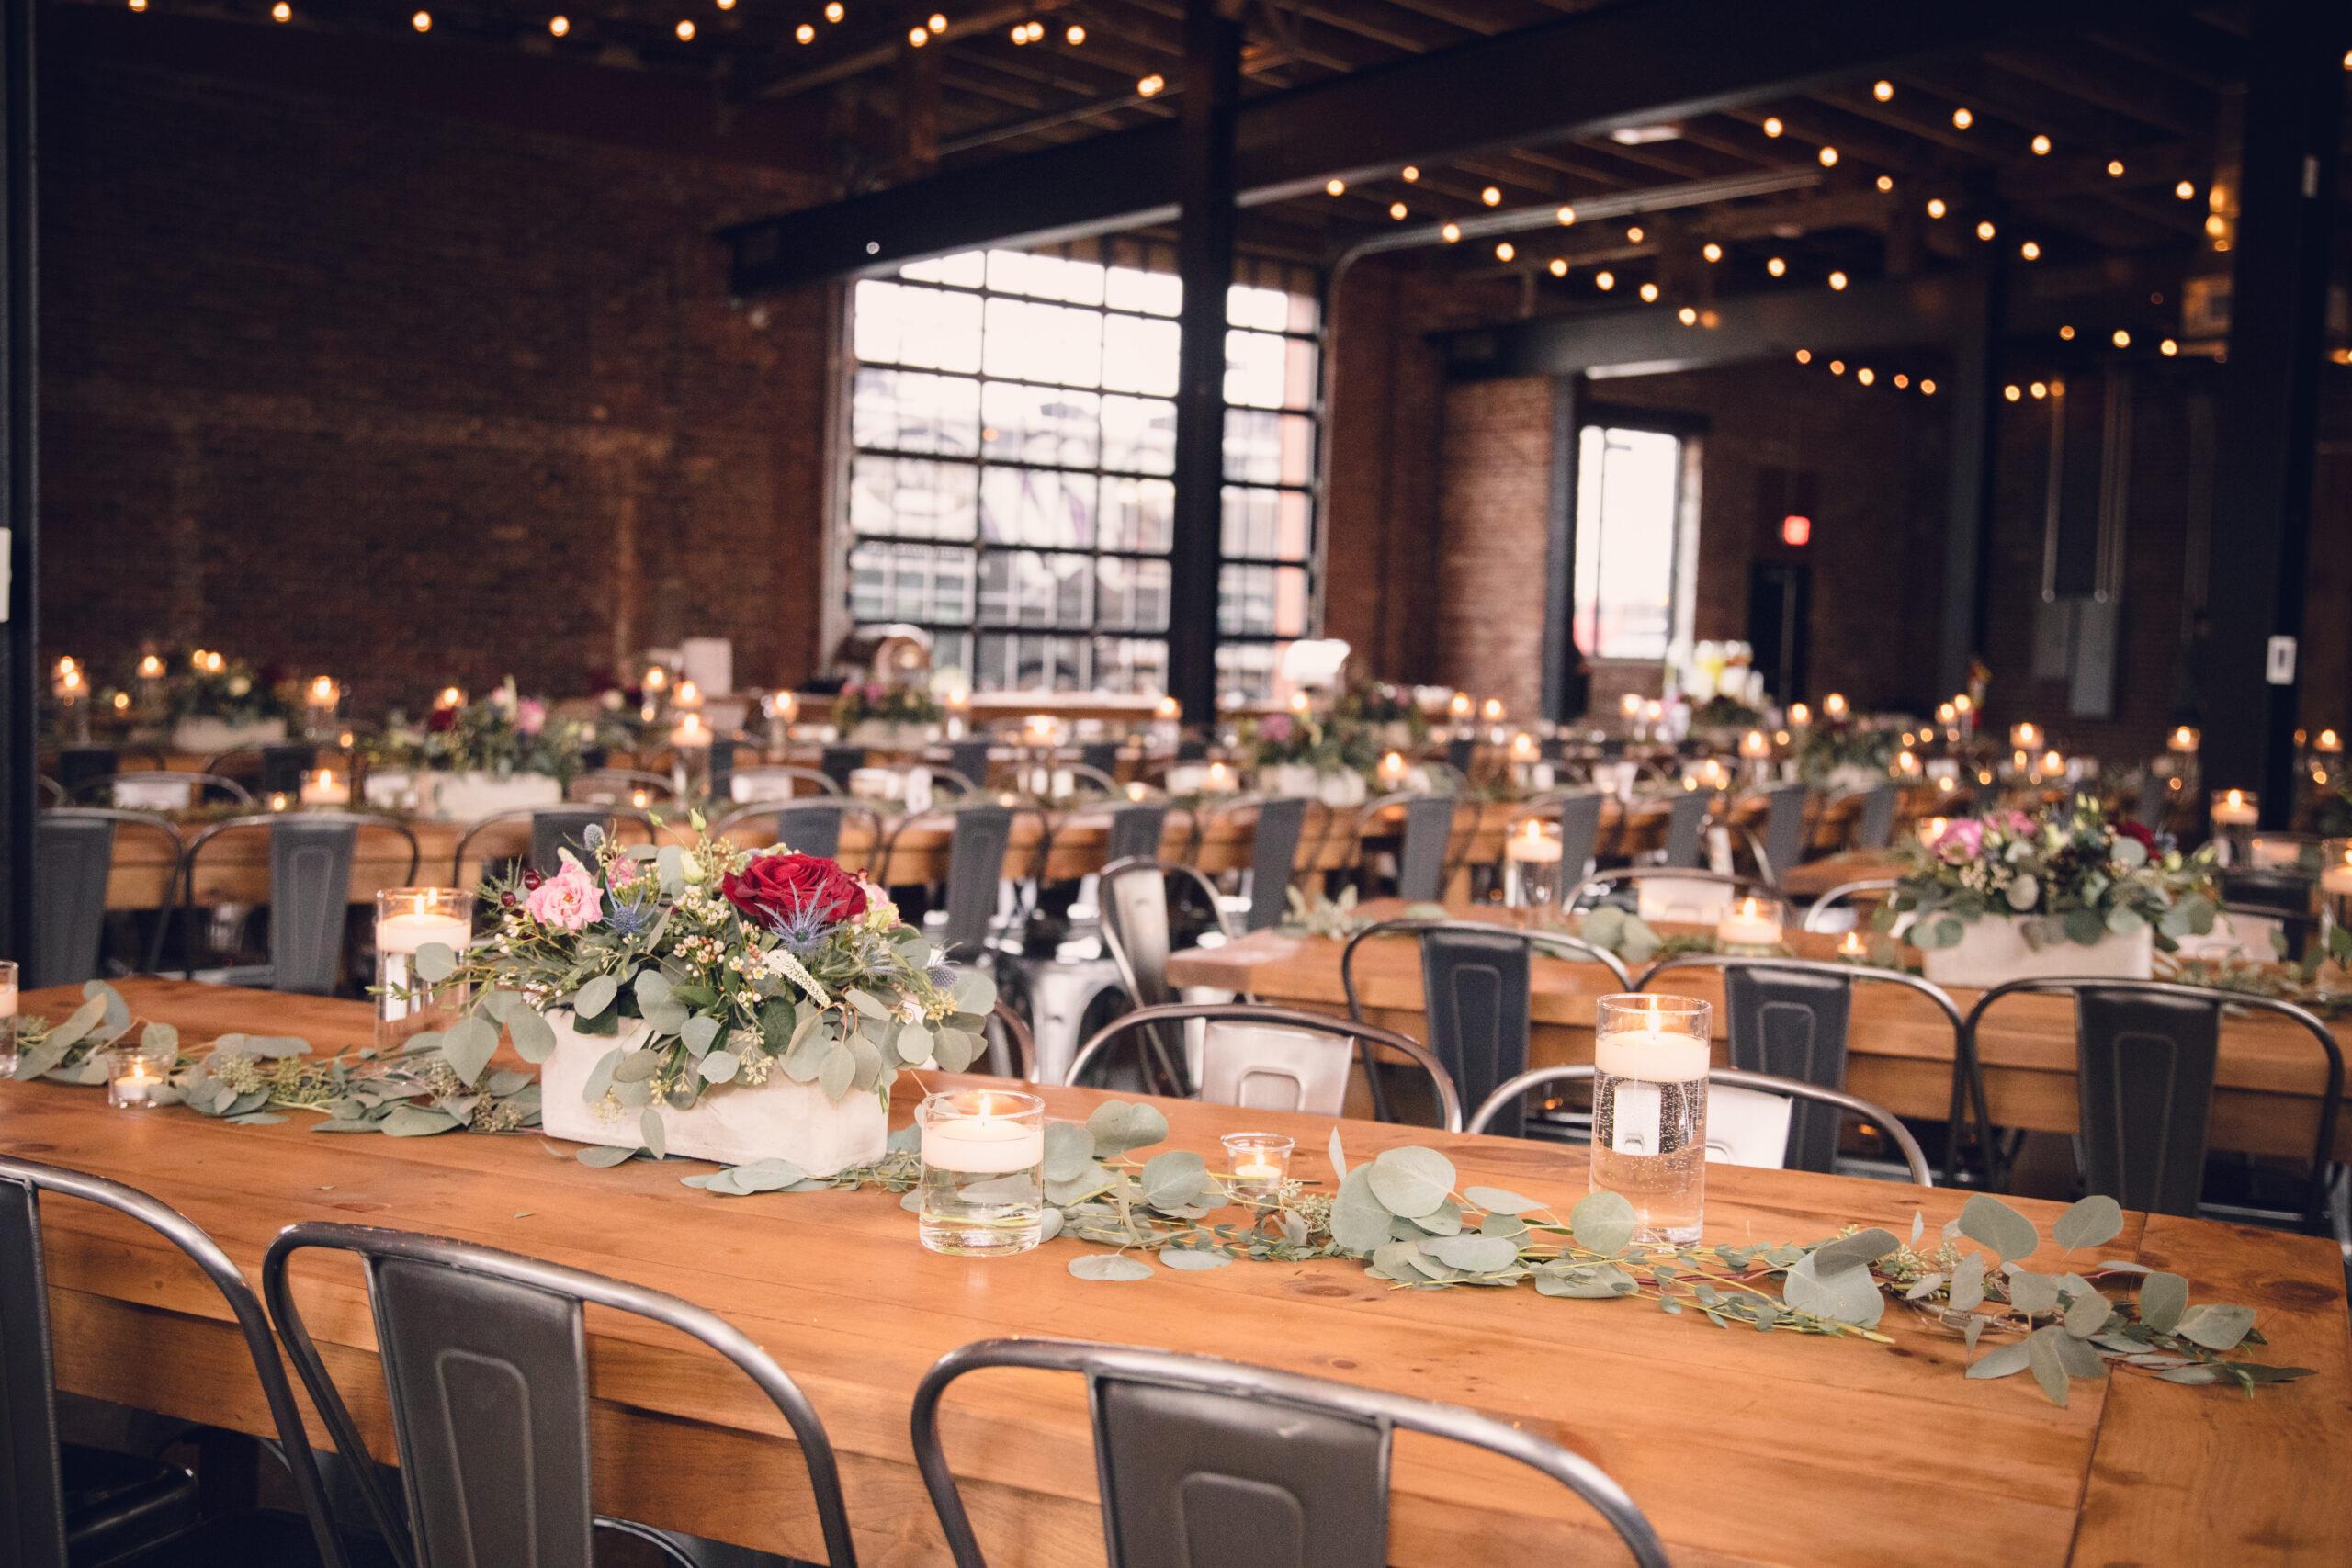 Indiana Event Decor Rentals